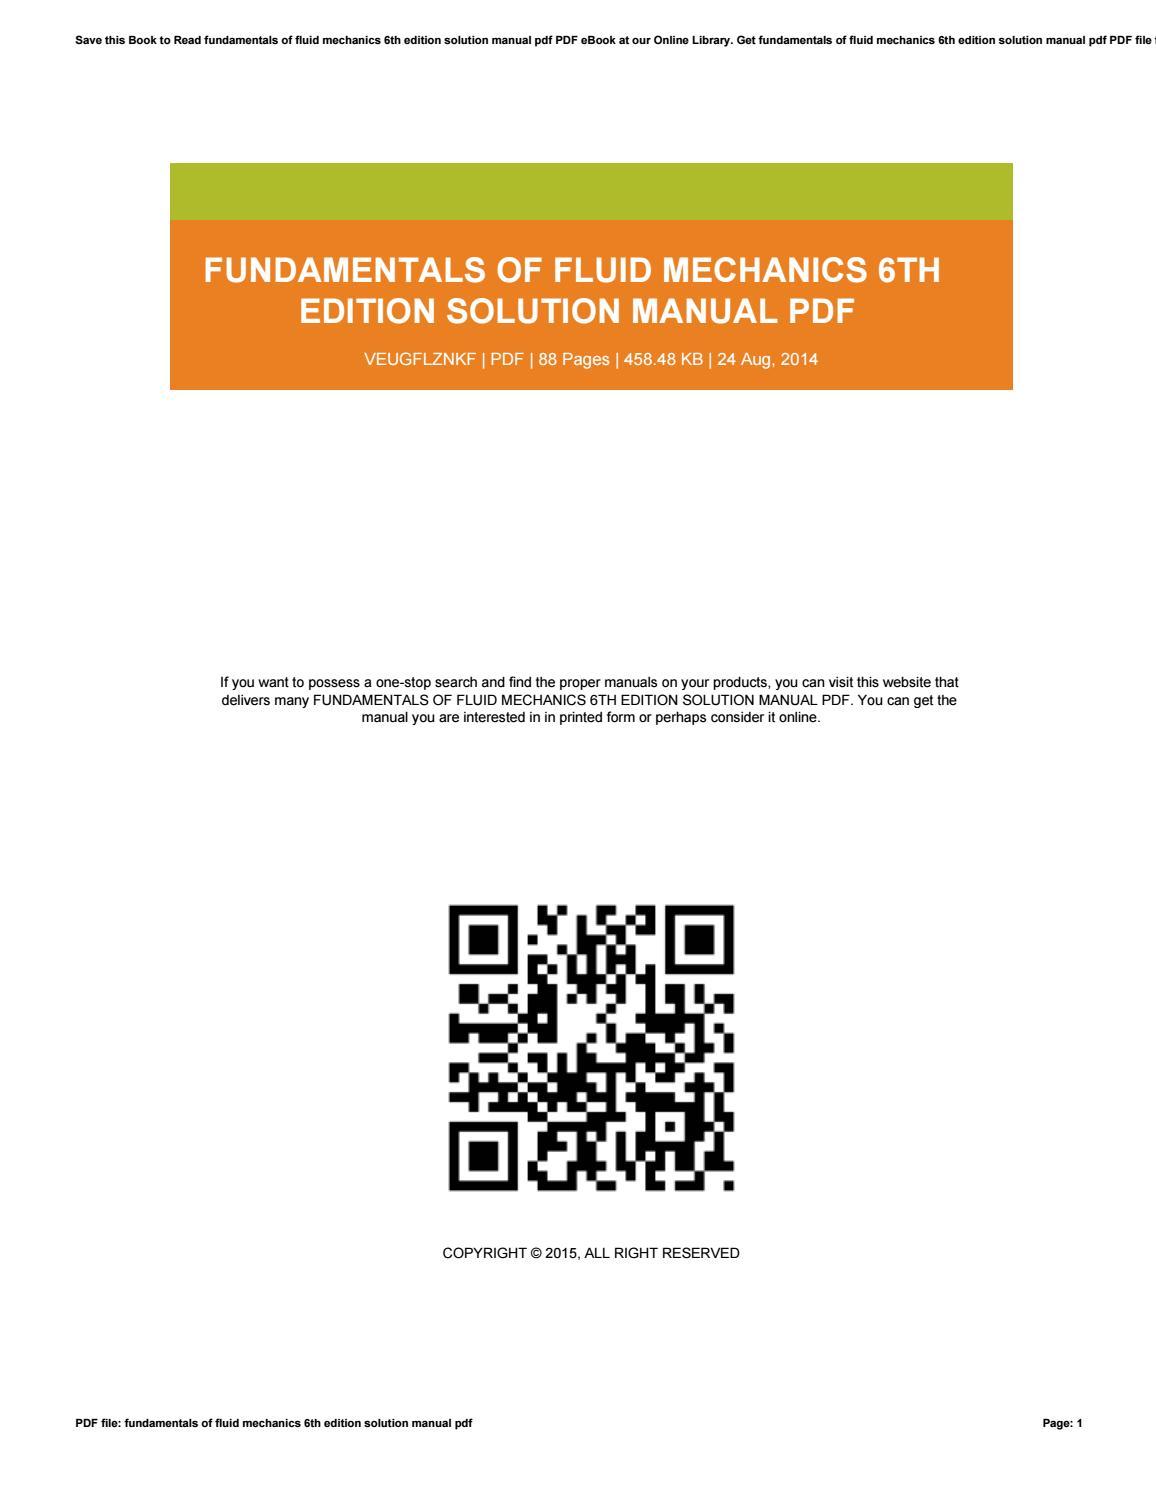 Engineering Fluid Mechanics 9th Edition Solutions Manual Pdf